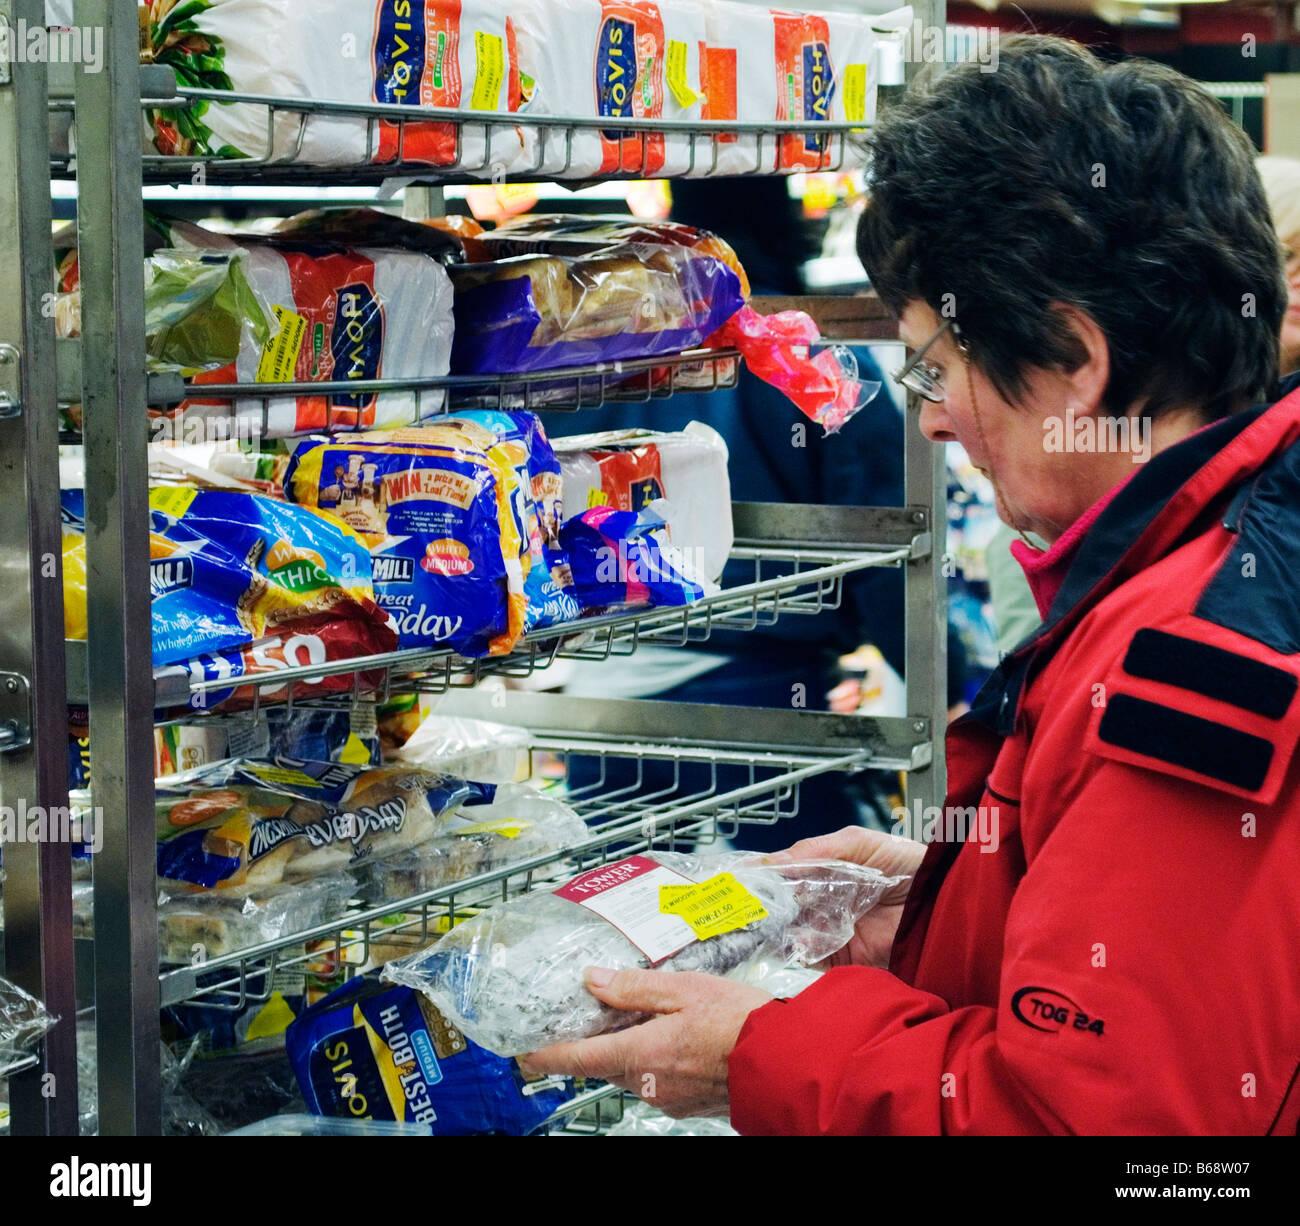 Supermarkets Rush To Raise Fuel Prices As The Pumps Run: Asda Price Stock Photos & Asda Price Stock Images